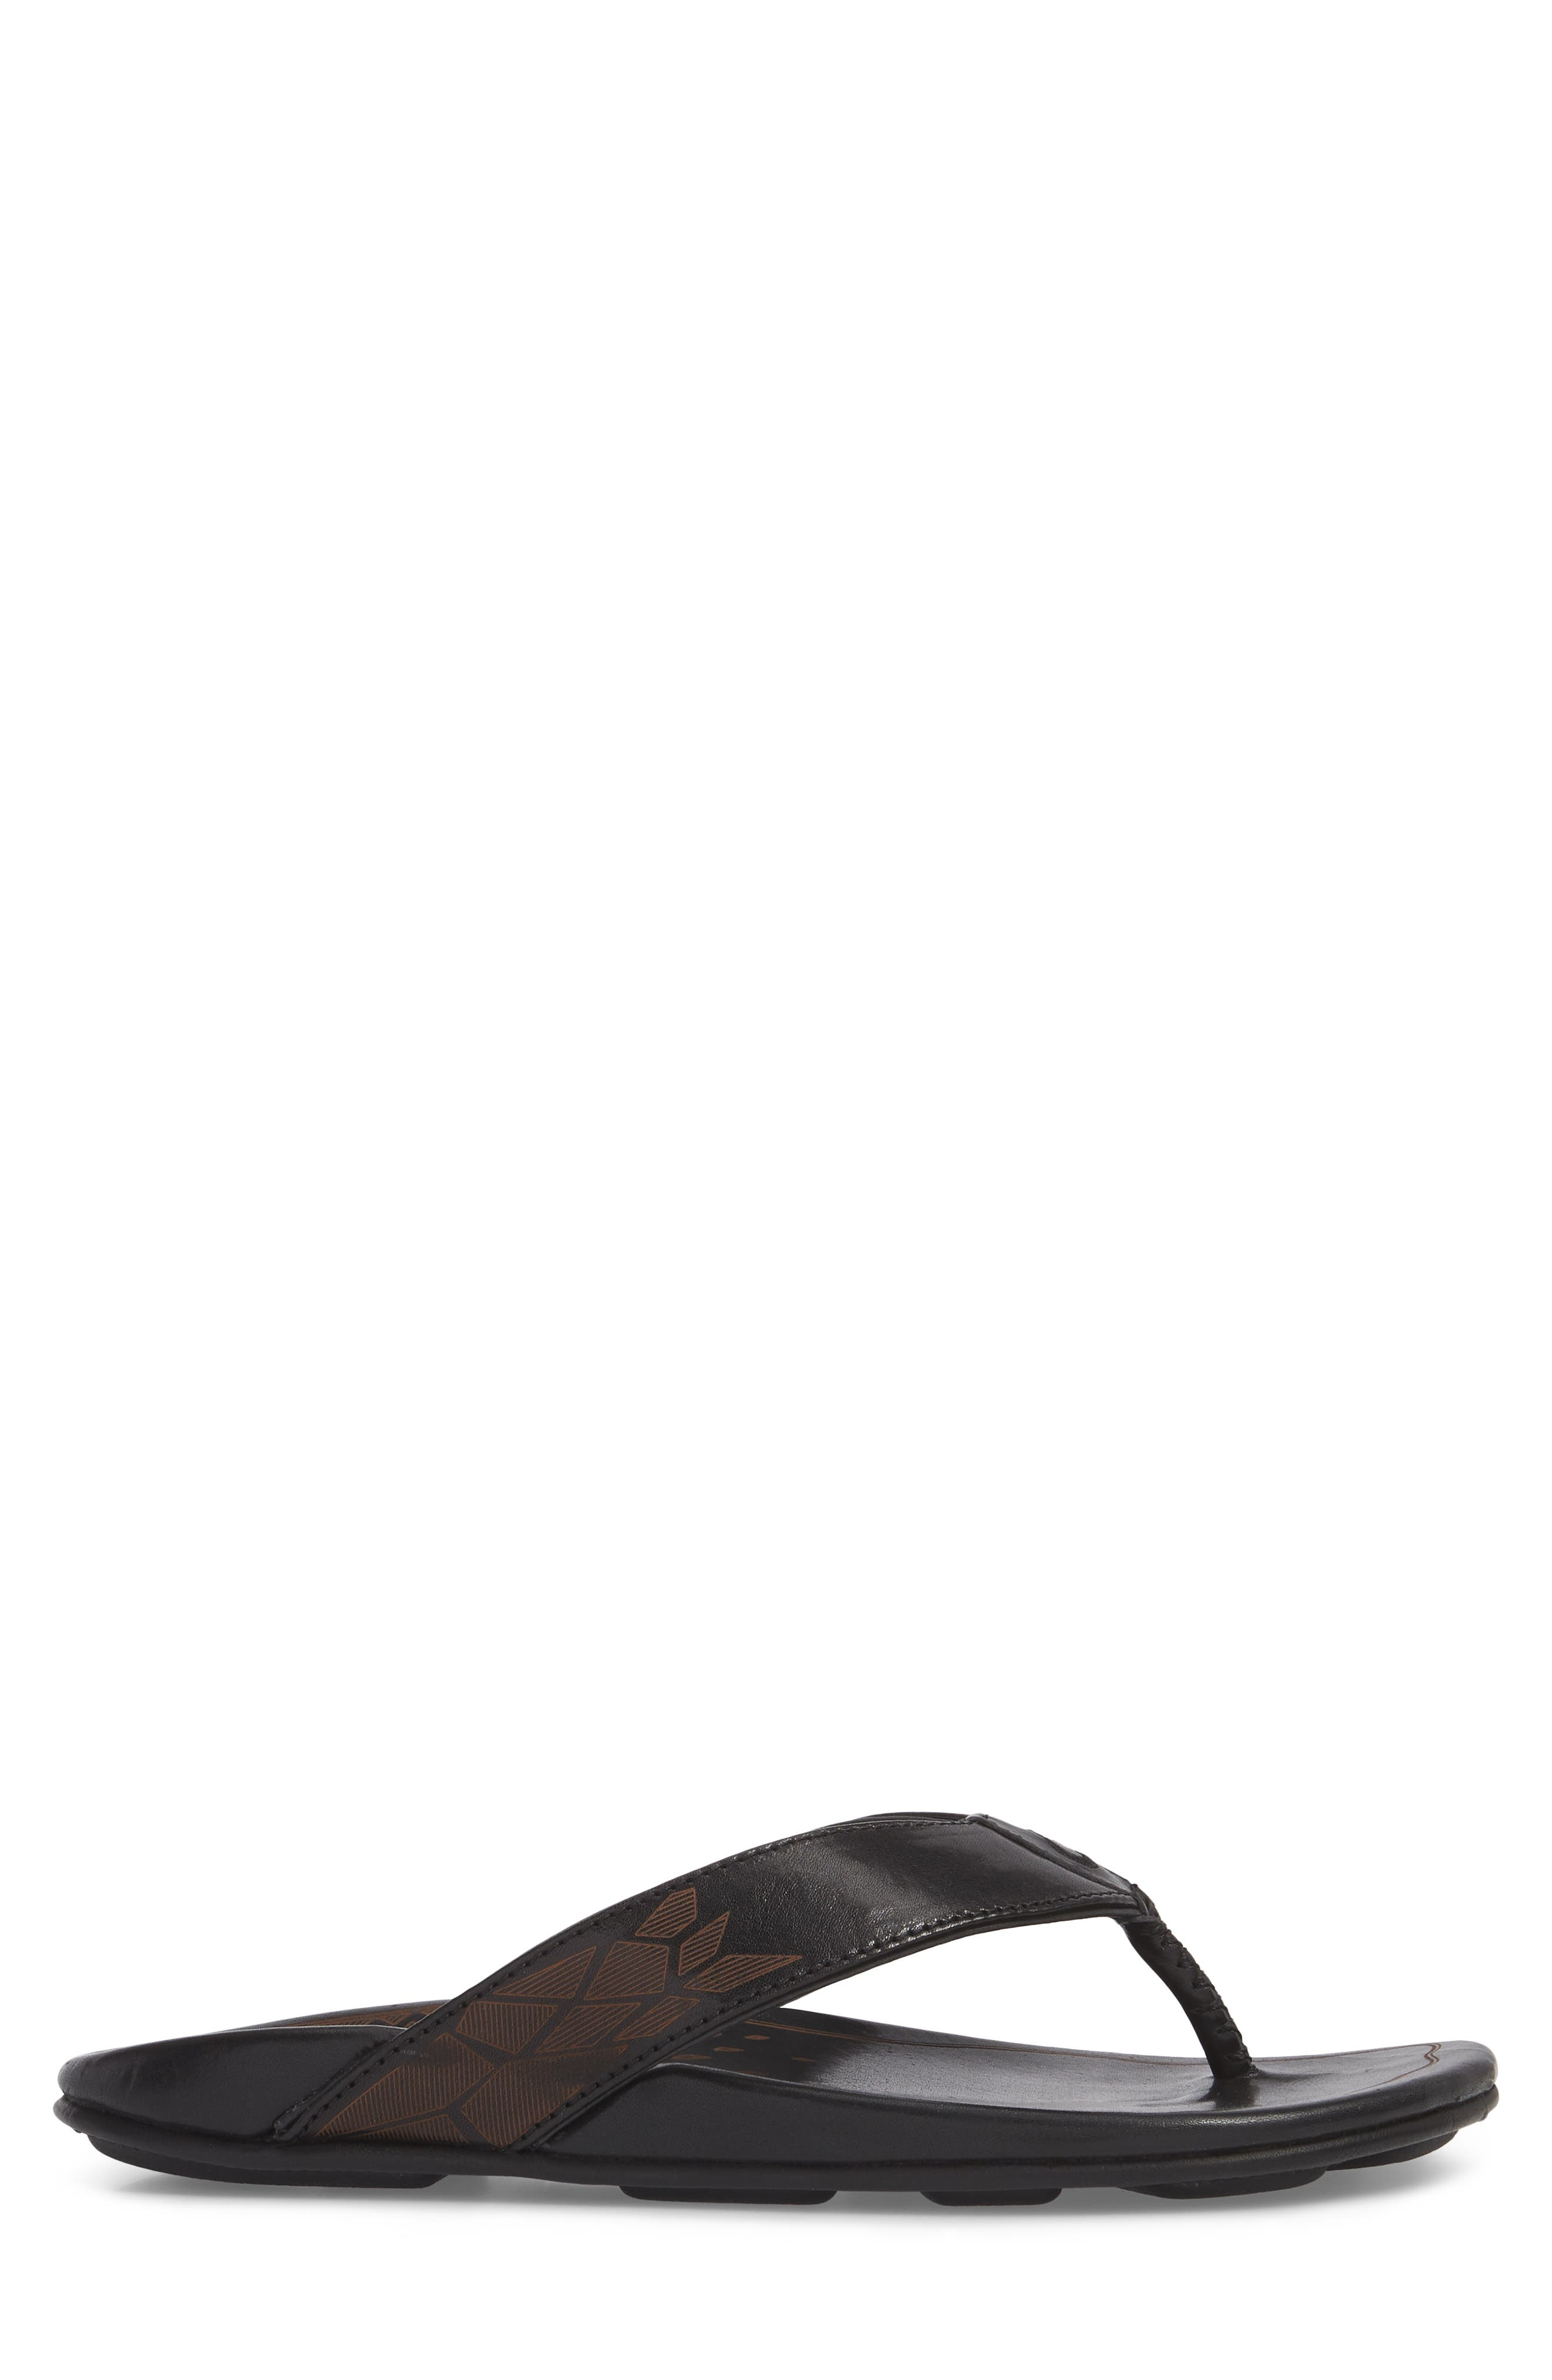 Kulia Flip Flop,                             Alternate thumbnail 3, color,                             BLACK/ BLACK LEATHER